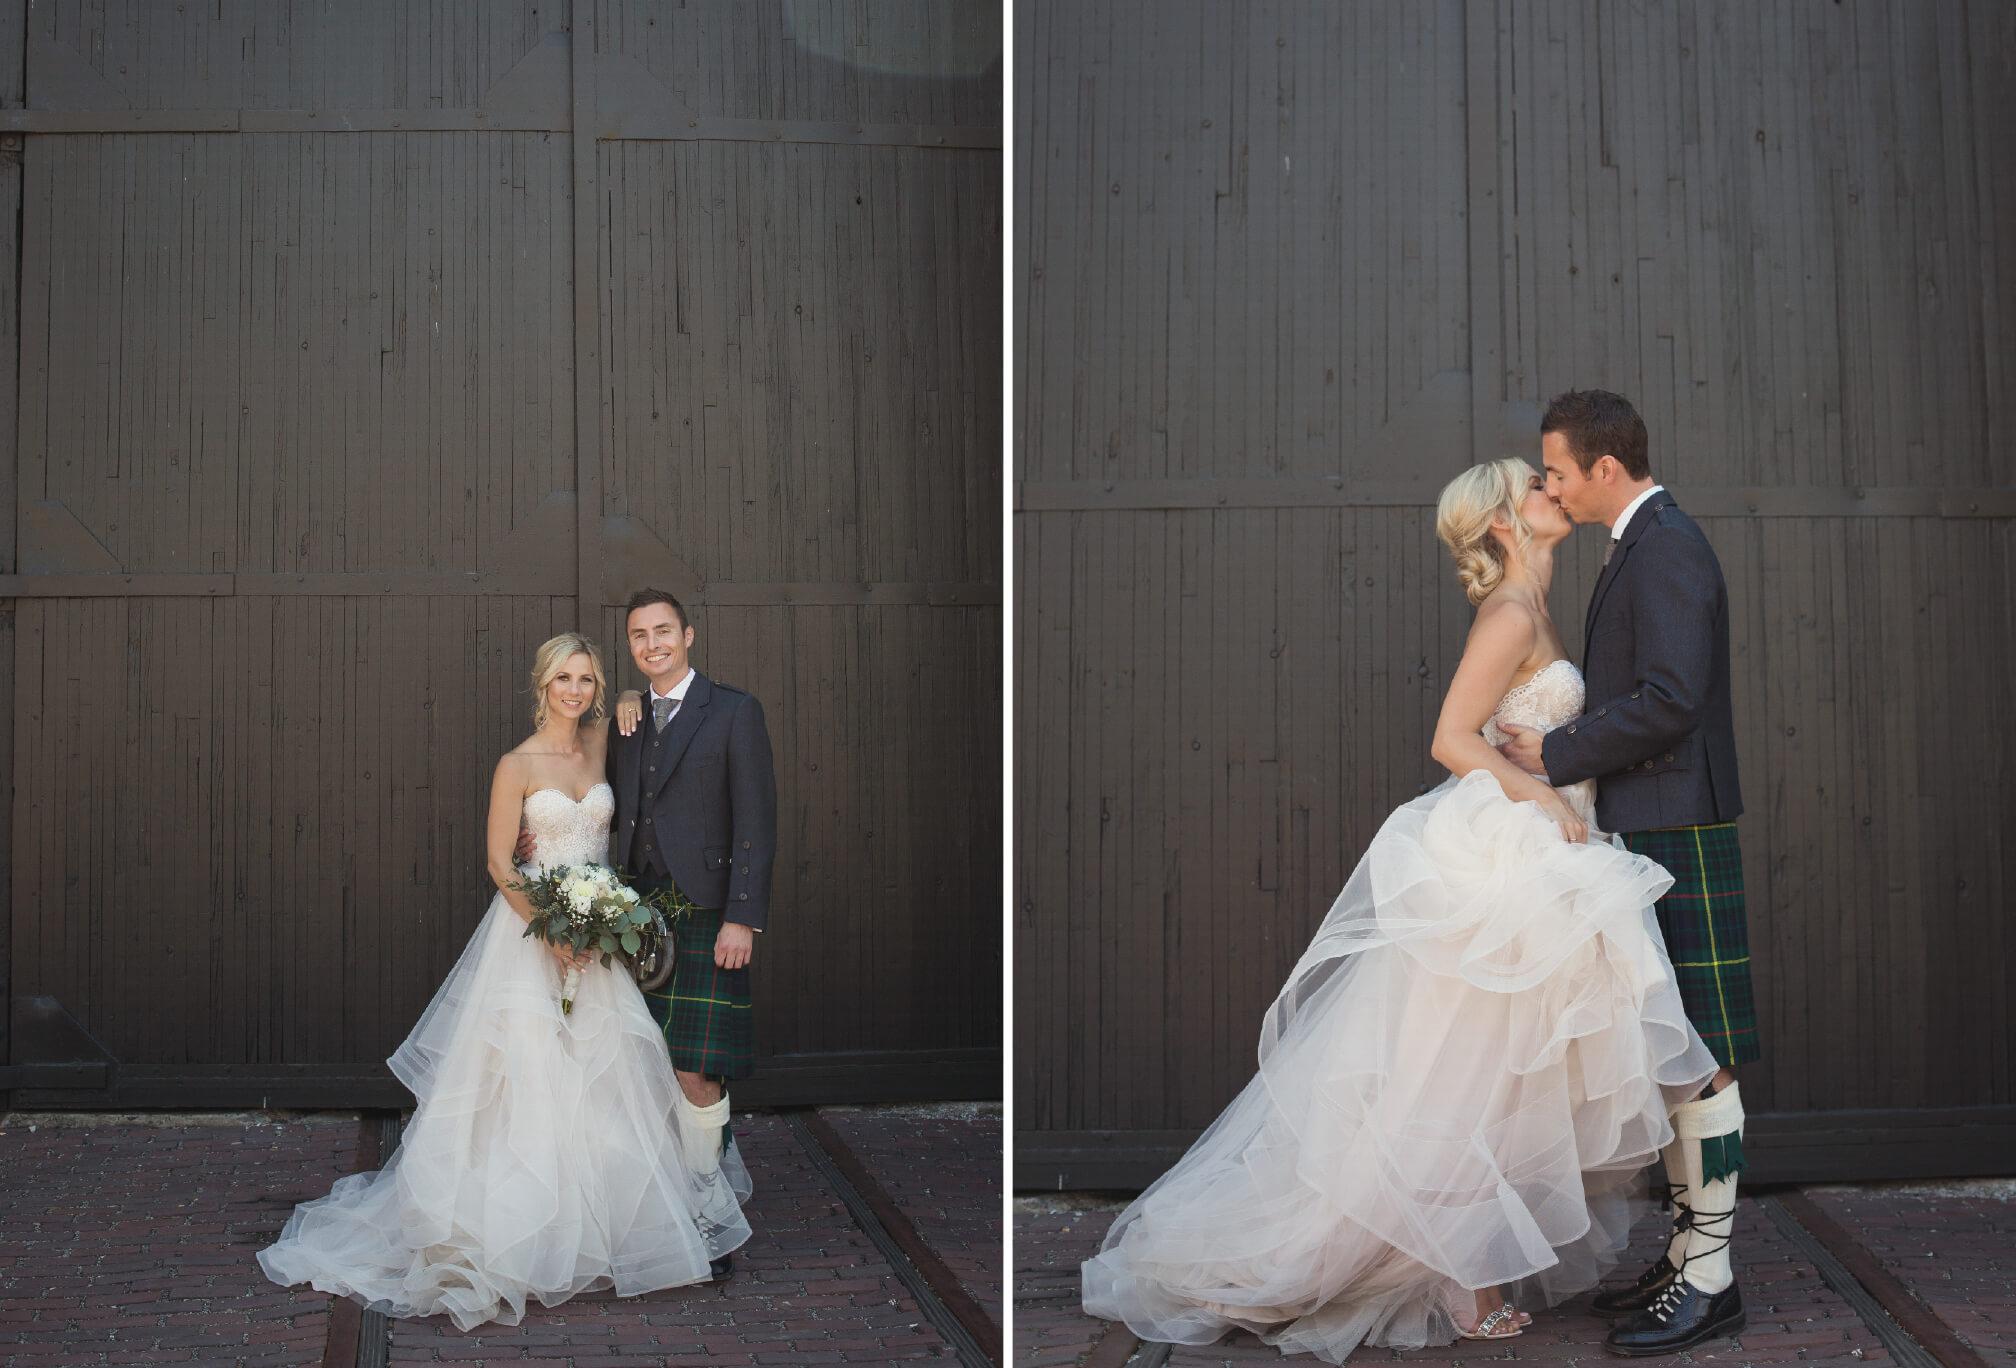 wedding photos near steam whistle brewery